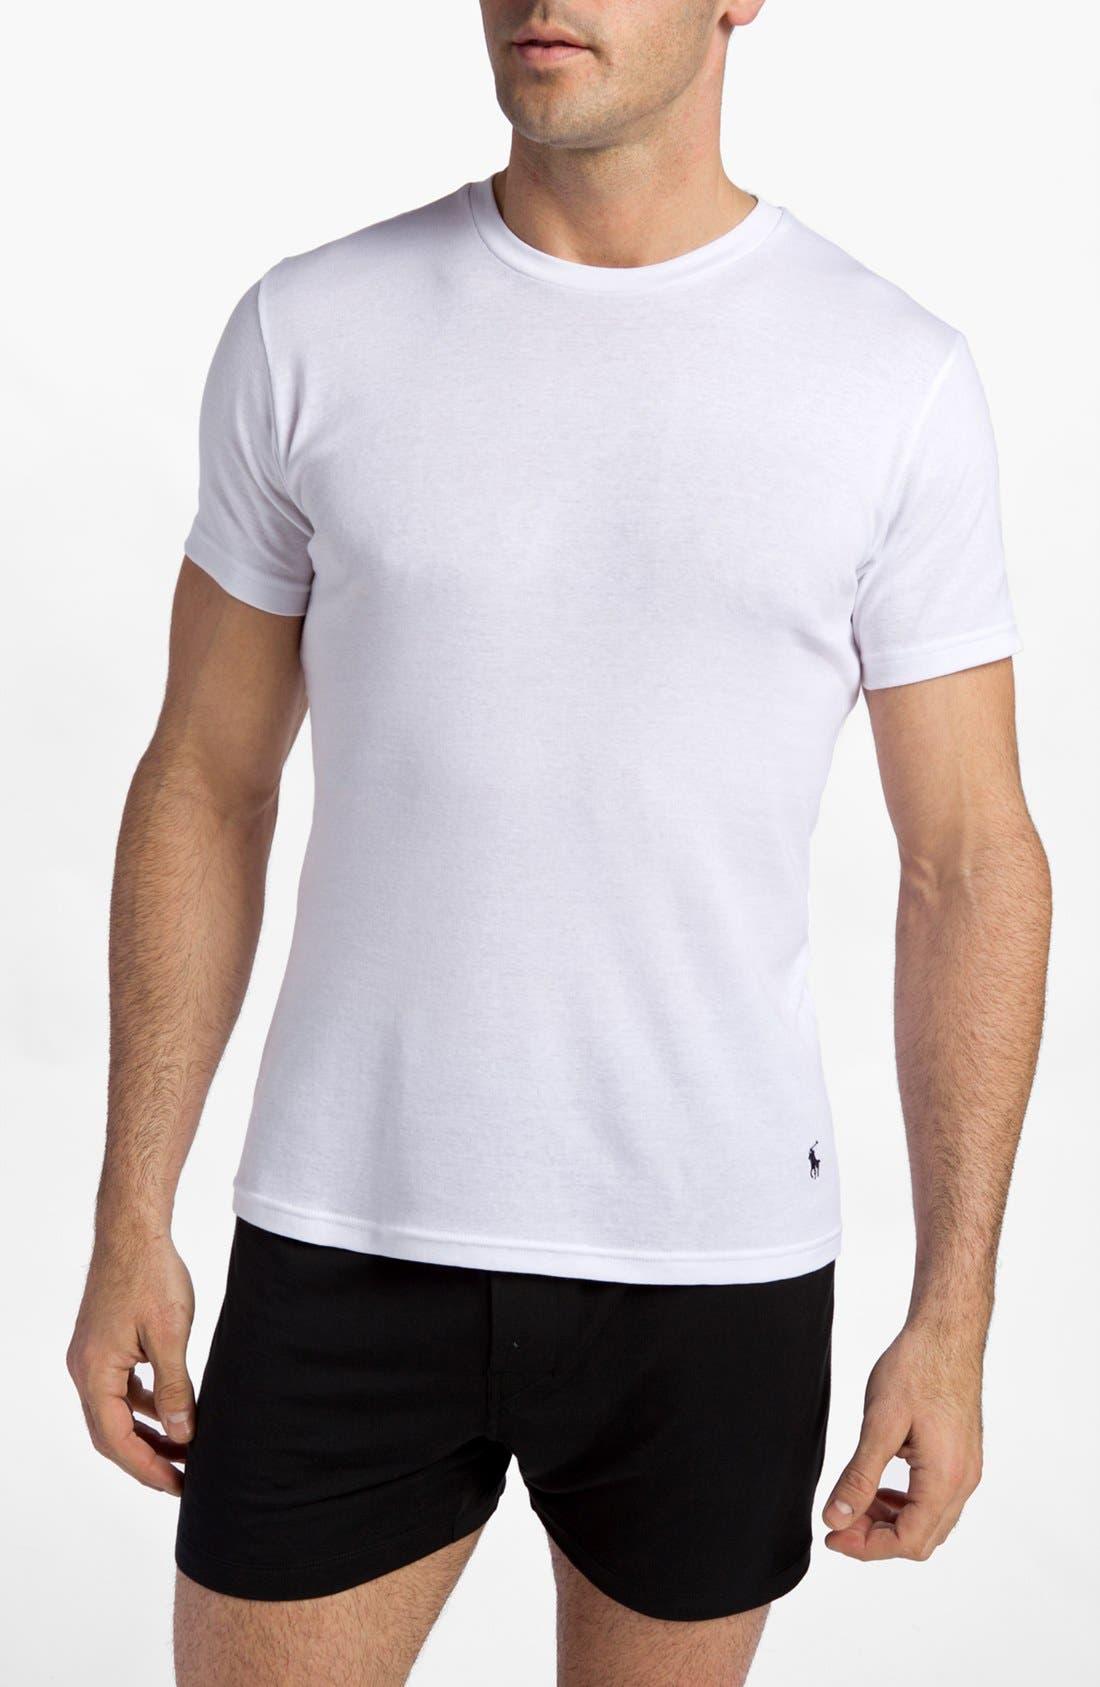 Polo Ralph Lauren 2-Pack Cotton Crewneck T-Shirt (Big)